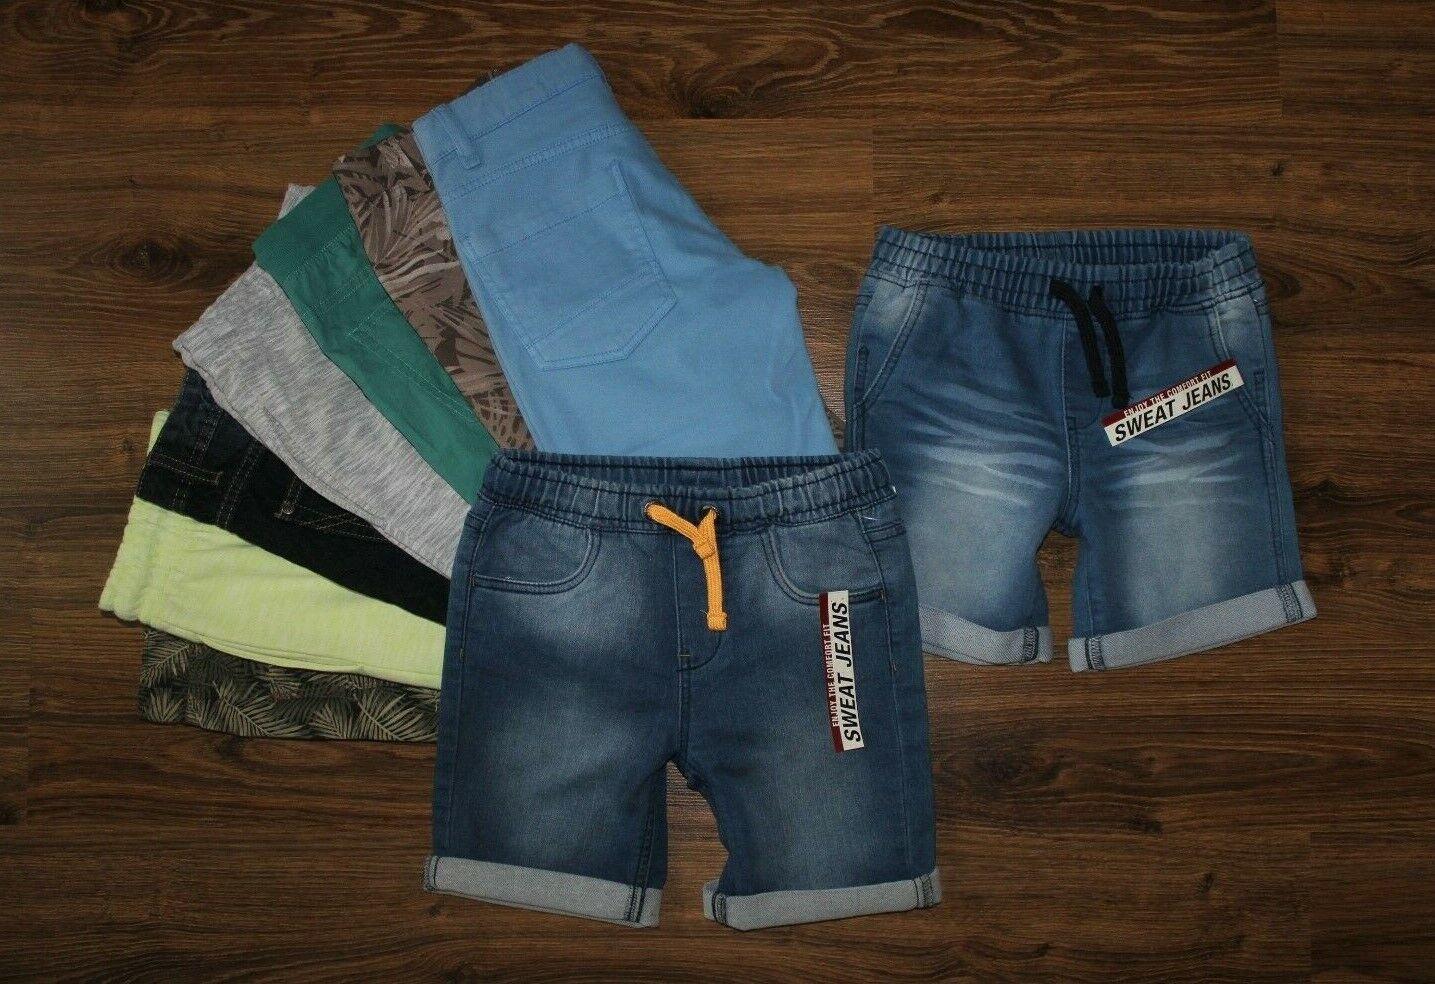 Junge kurze Hose Jeans Jeanshose Shorts Bermuda AUSWAHL  134 140 146 152  NEU